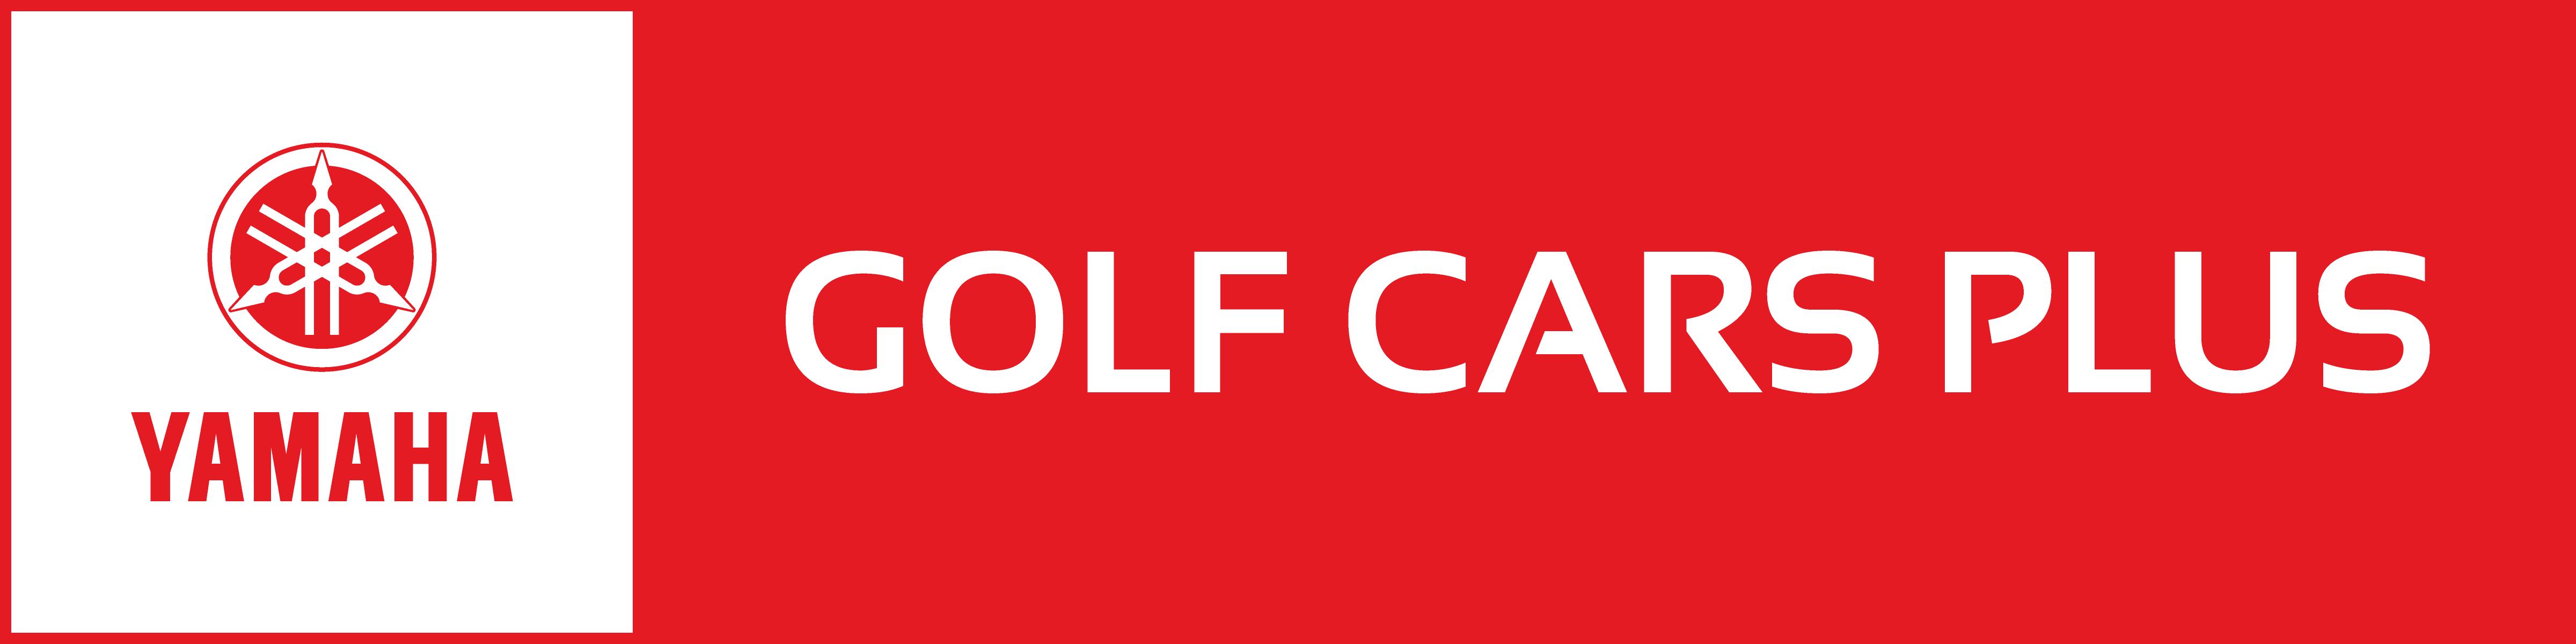 Golf Cars Plus image 4